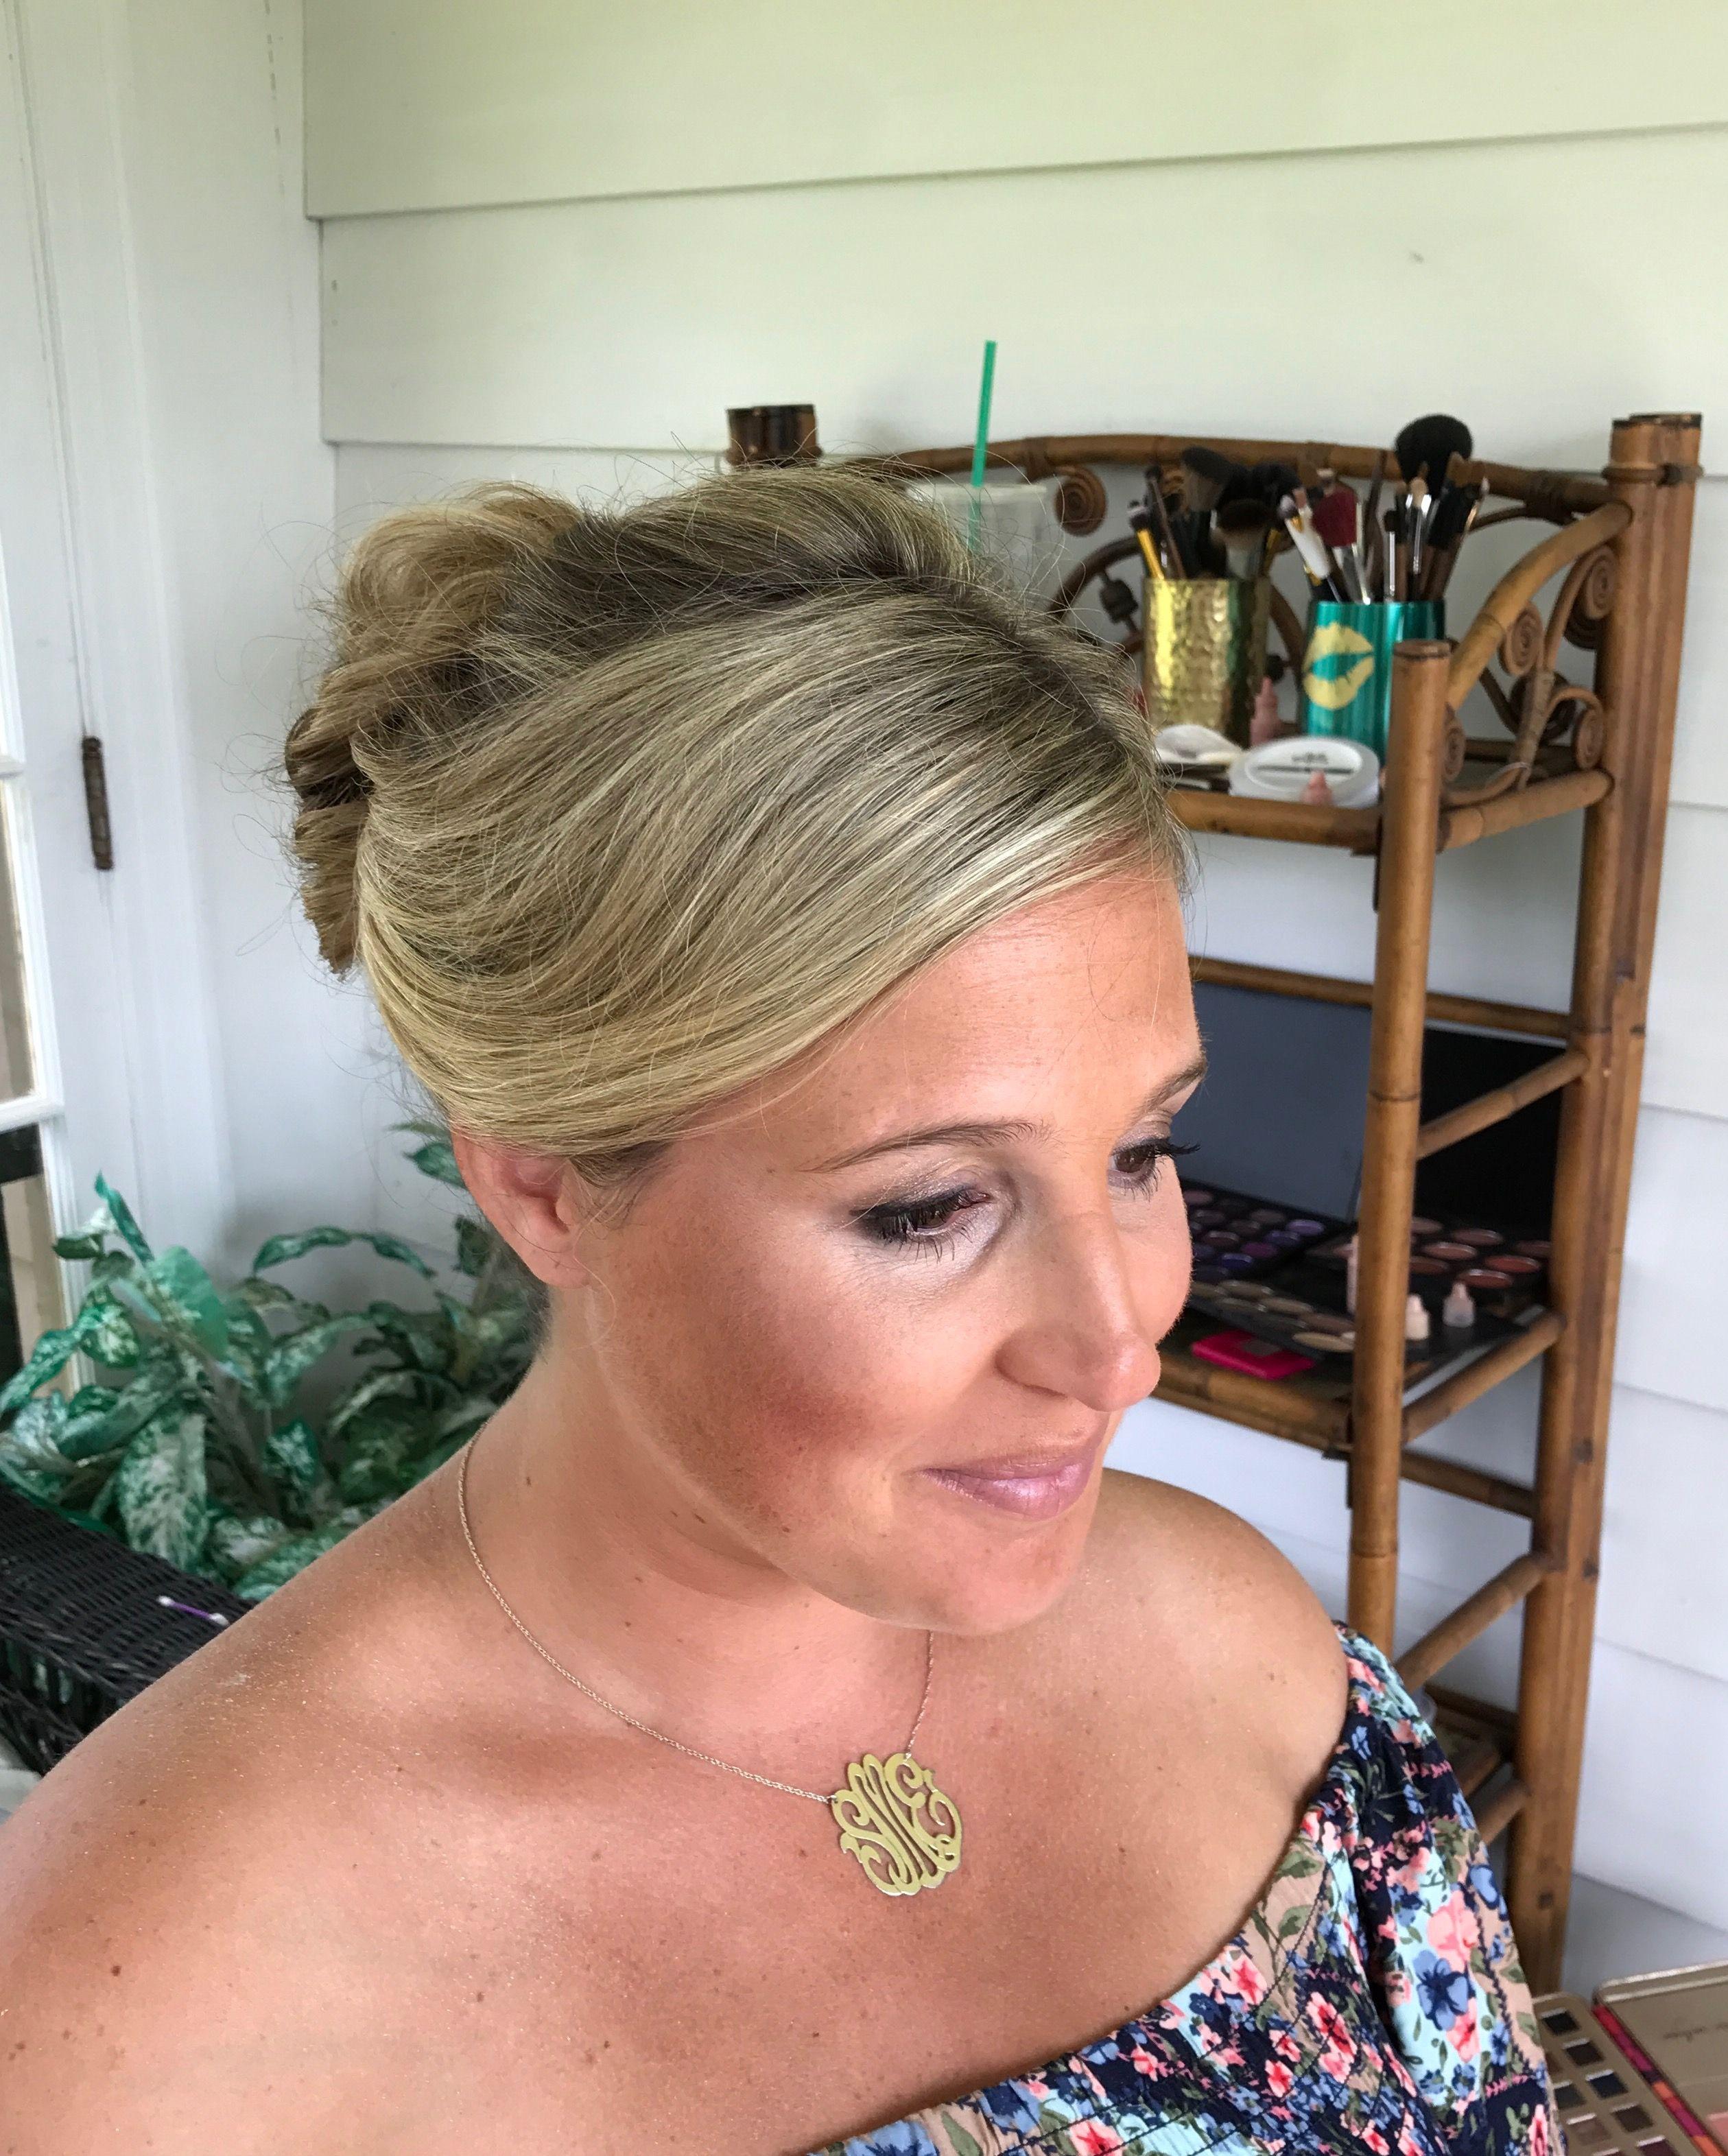 hair and makeup by kat oropallo#katherine elizabeth salon